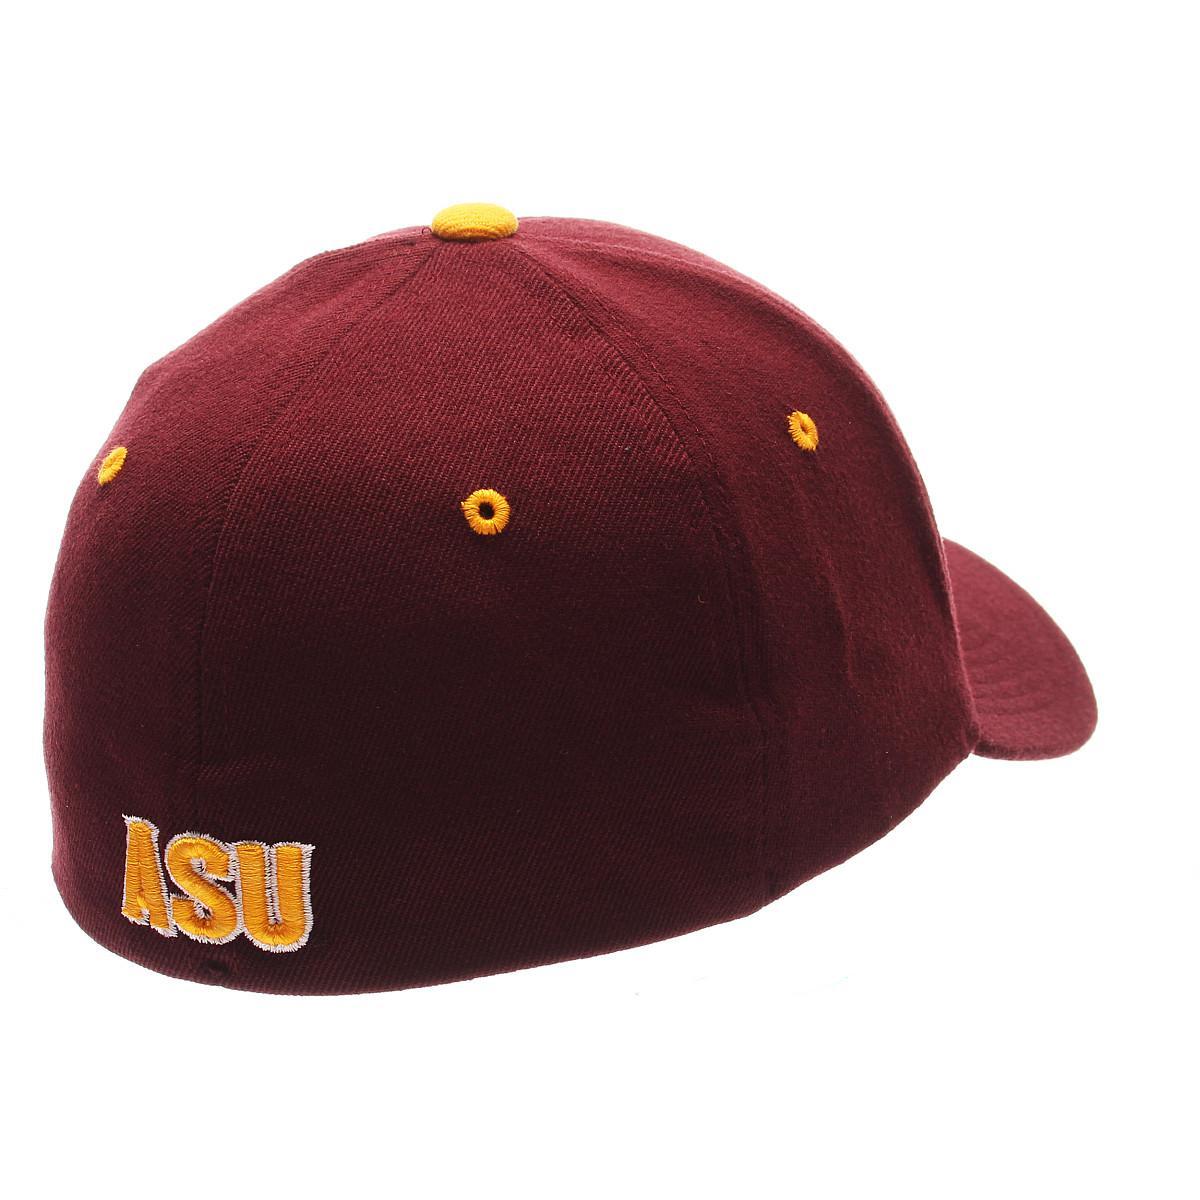 Zephyr-Men-039-s-Arizona-State-Sun-Devils-ZHS-Zwool-Stretch-Fit-Hat thumbnail 4